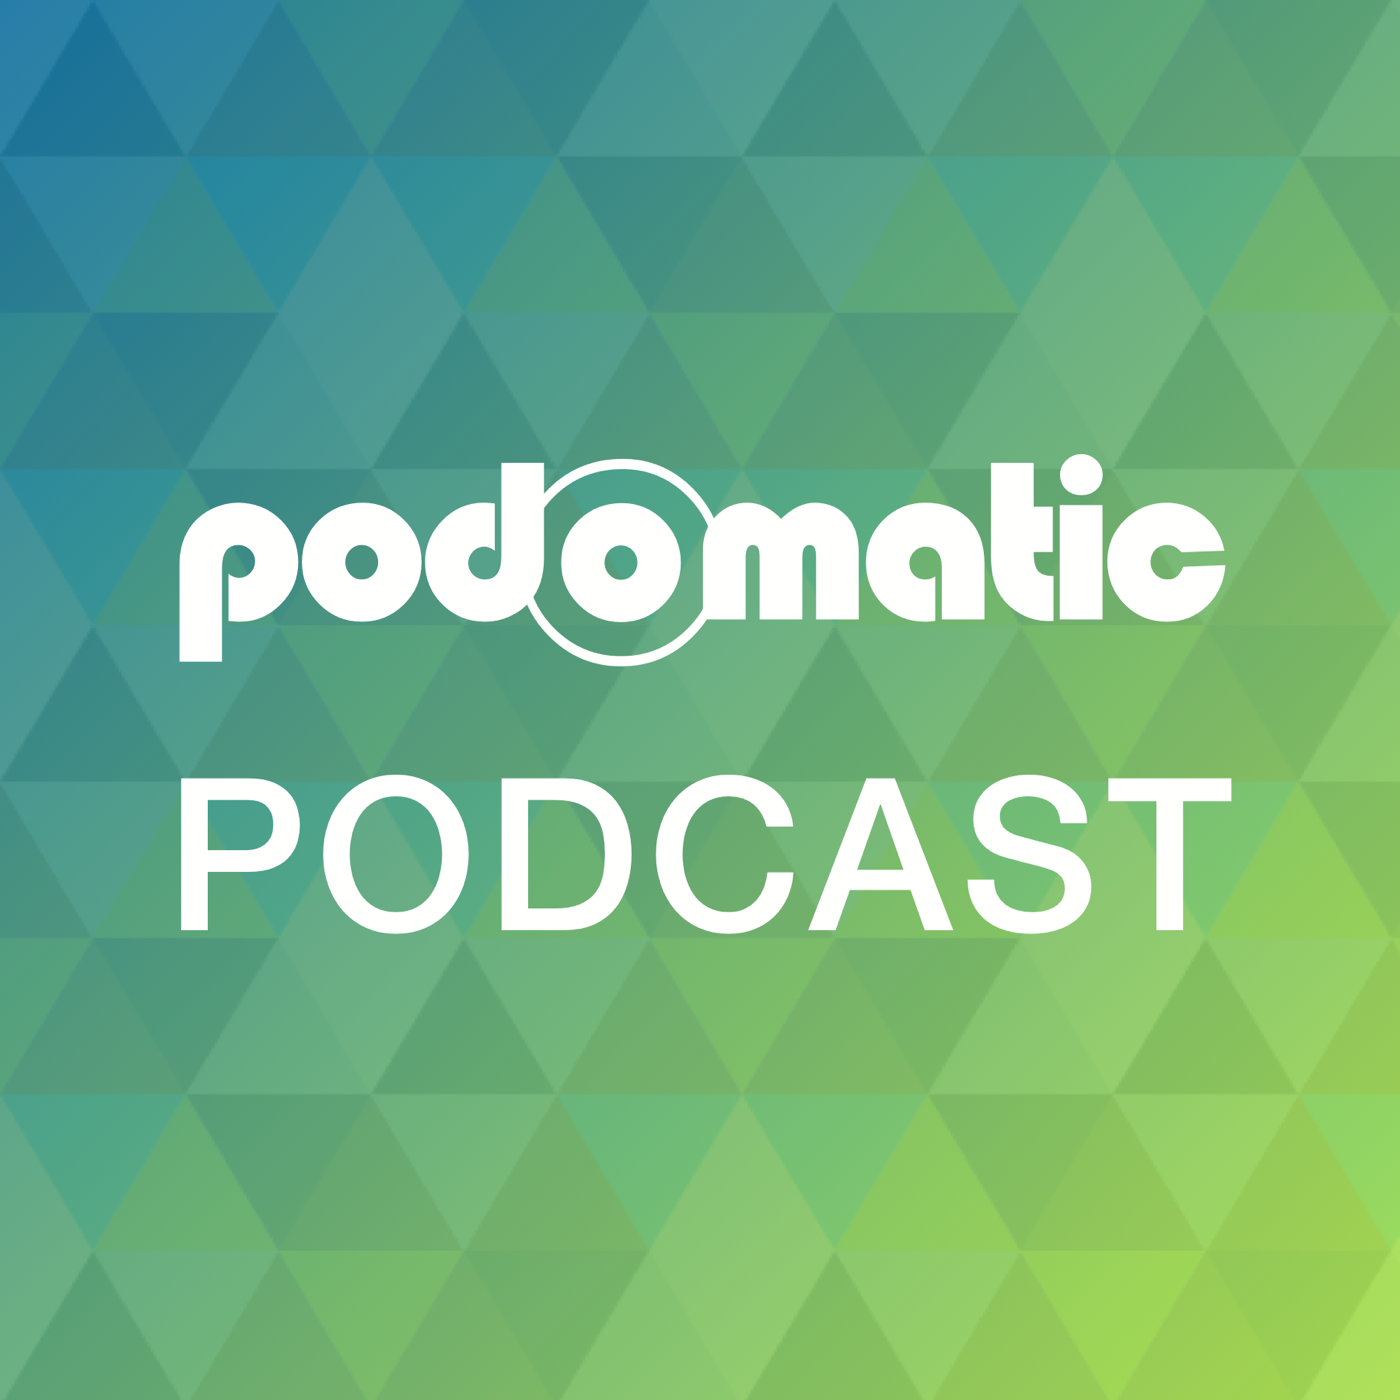 Sonido fanboy Podcast